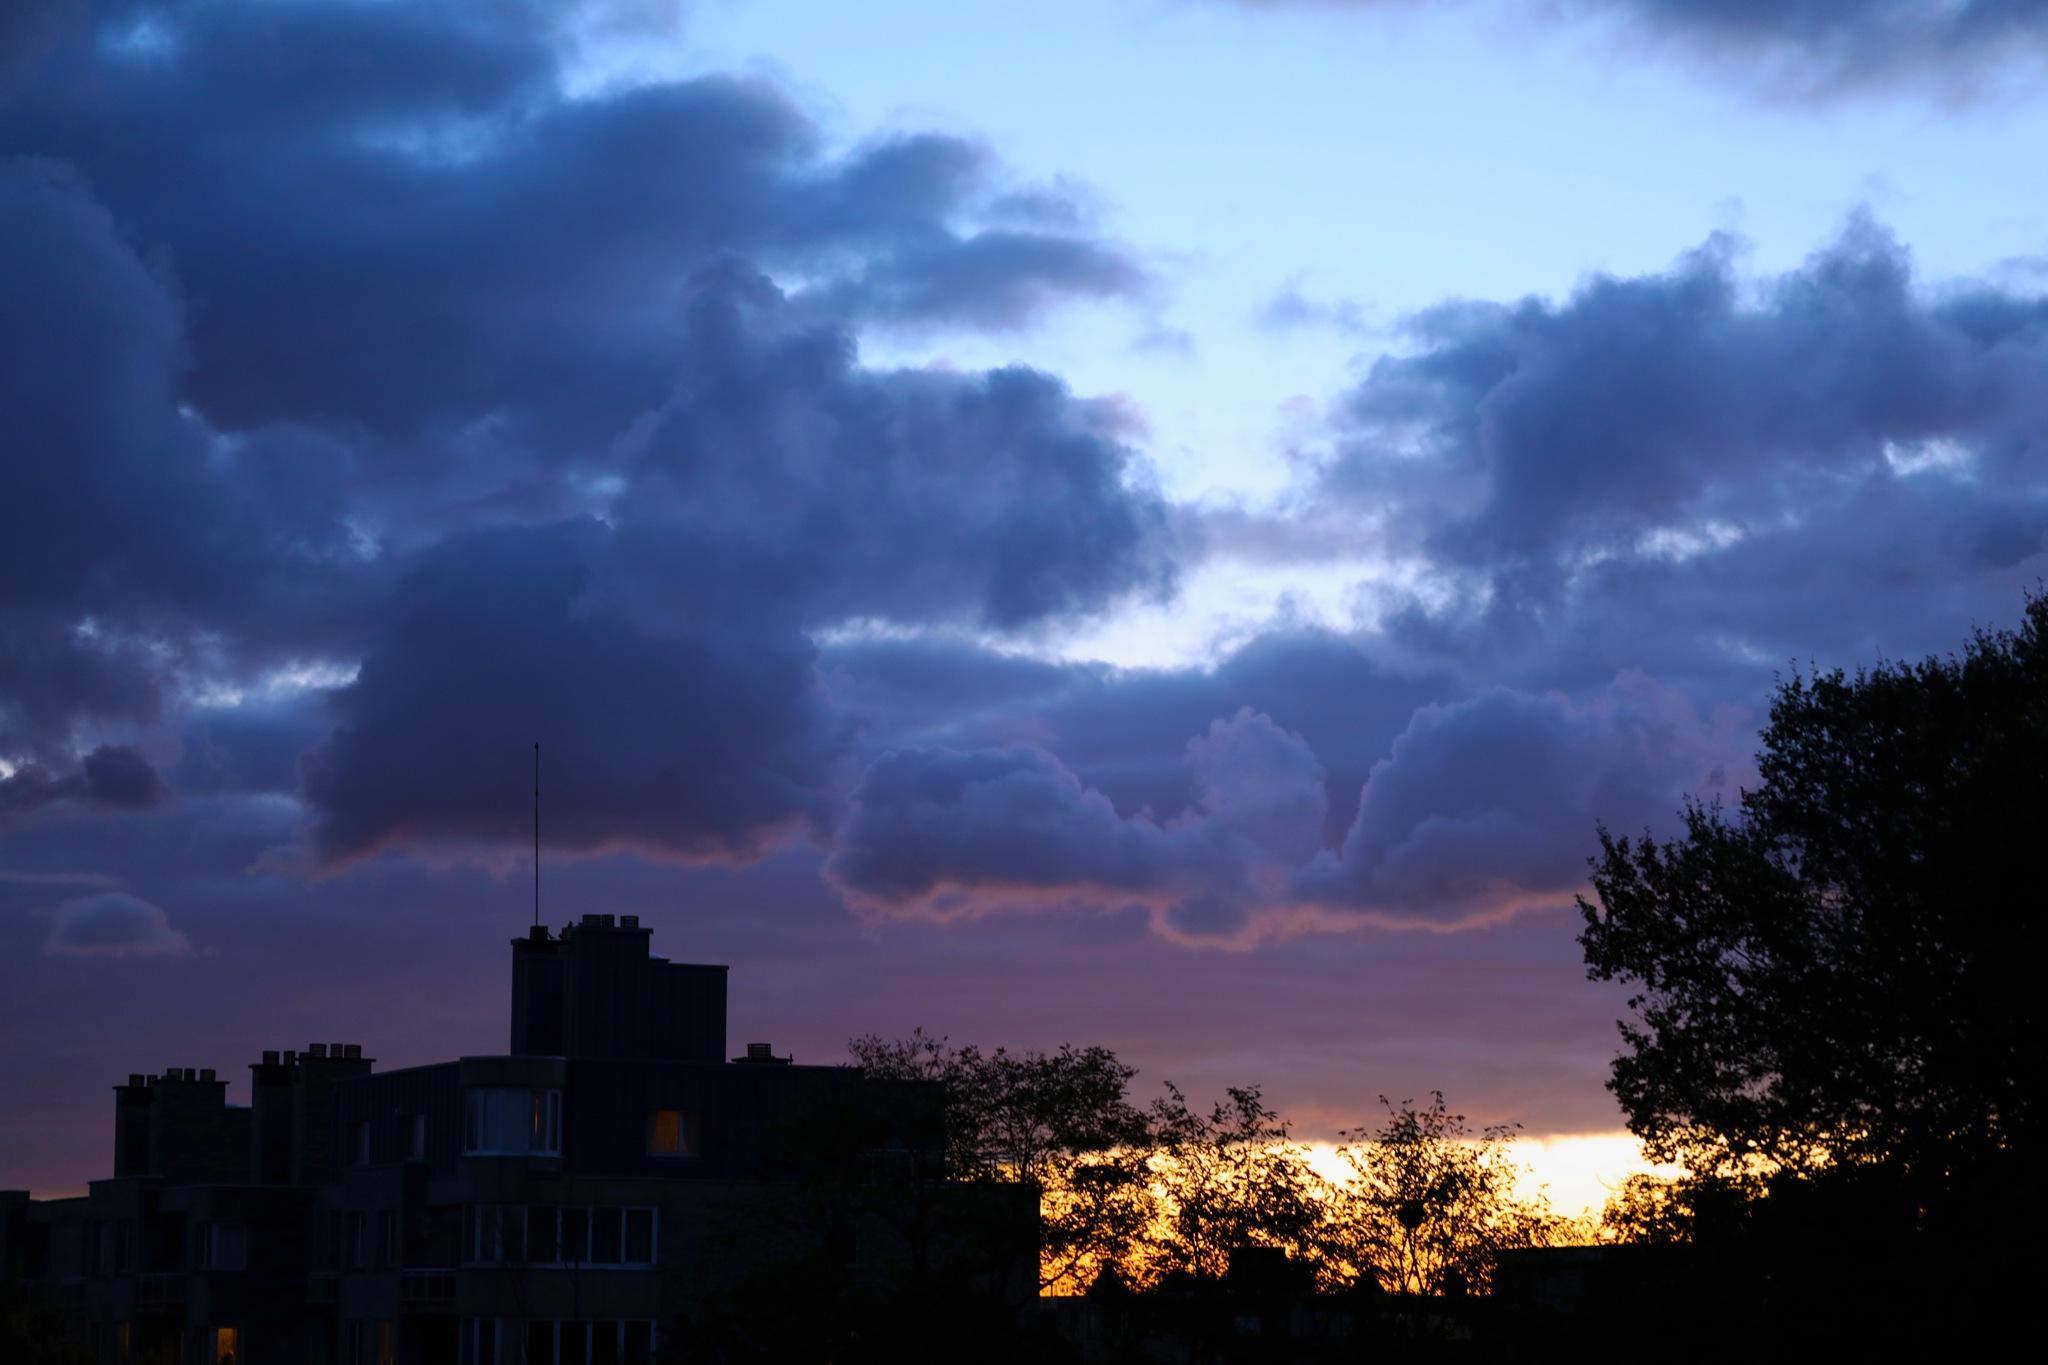 Sunset by Allesosalbenoemd